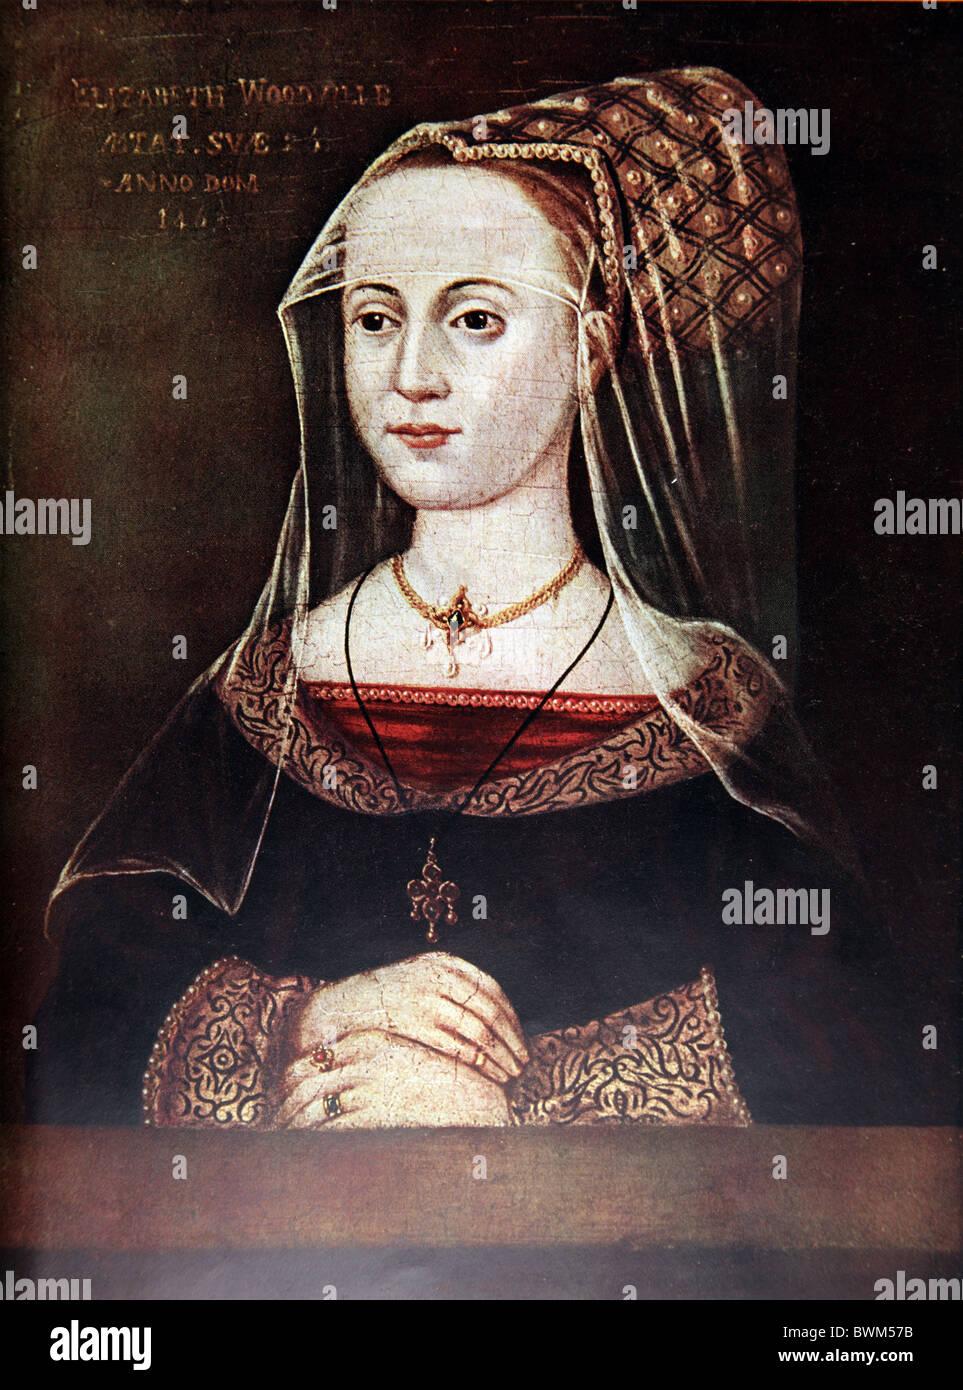 Portrait of Elizabeth Woodville, Queen consort of Edward IV 1463 - Stock Image